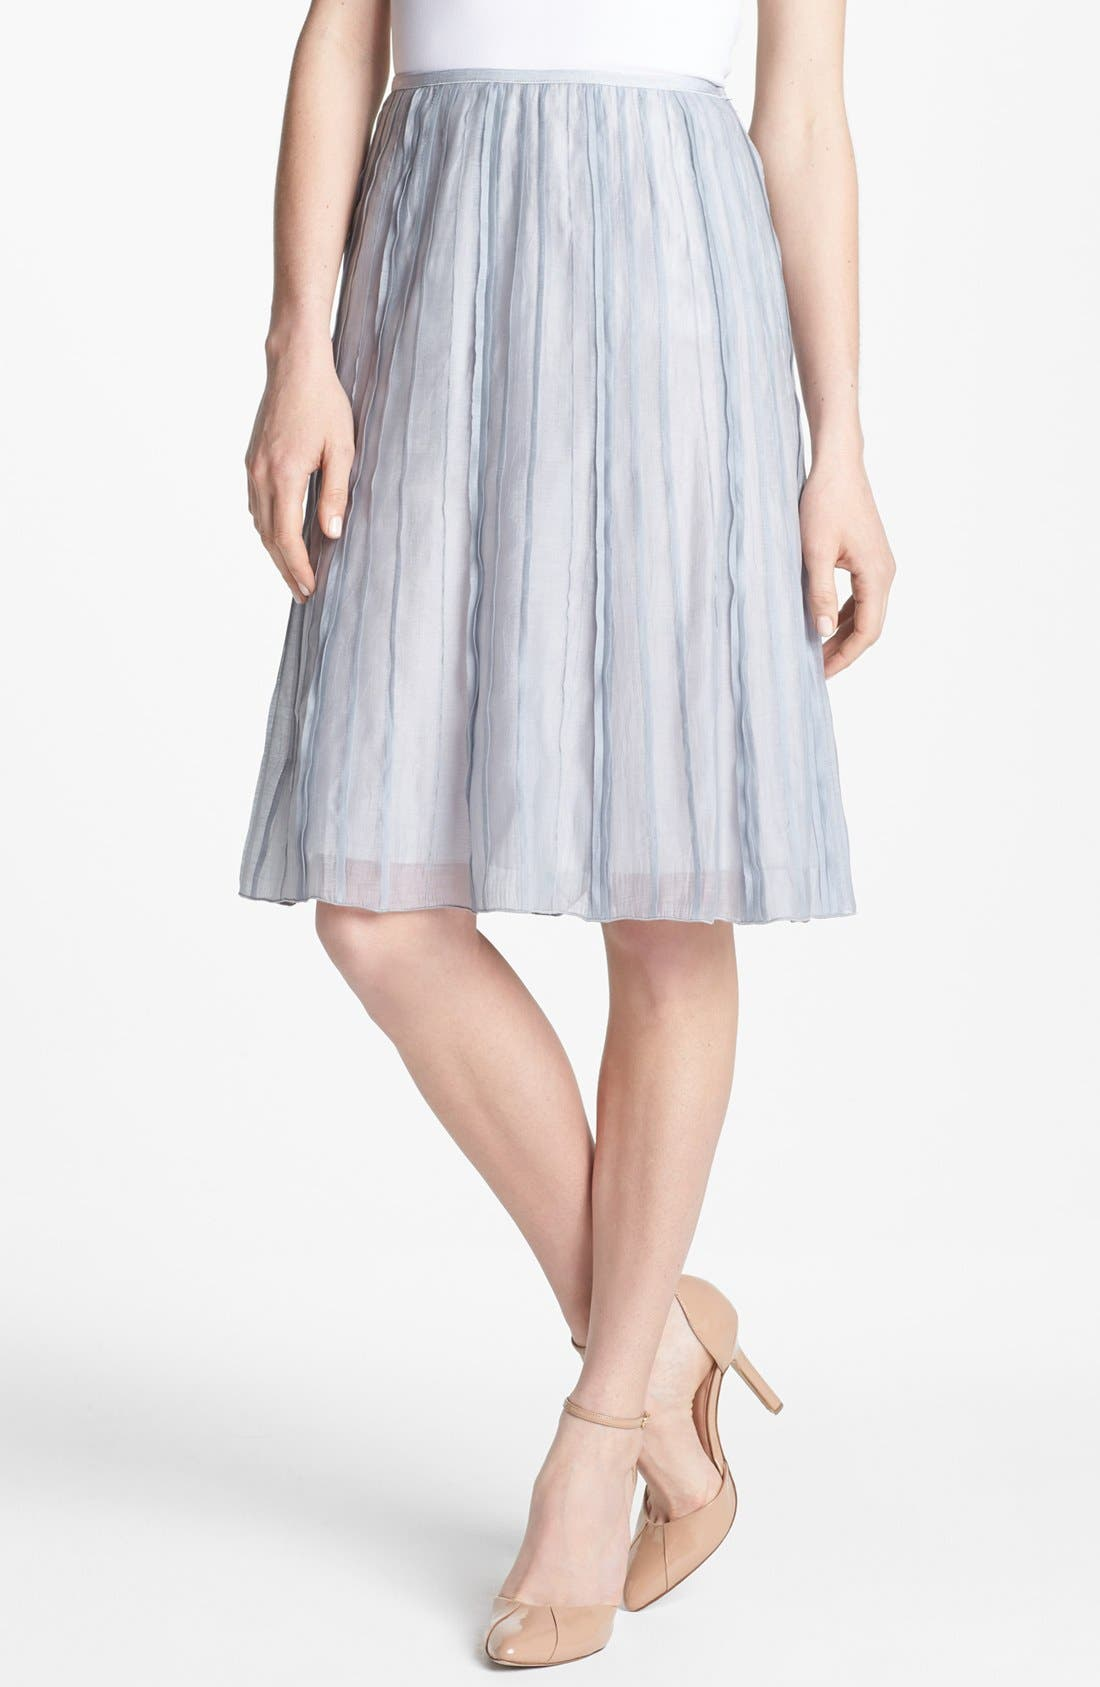 NIC+ZOE Nic + Zoe 'Batiste' Flared Skirt, Main, color, 041